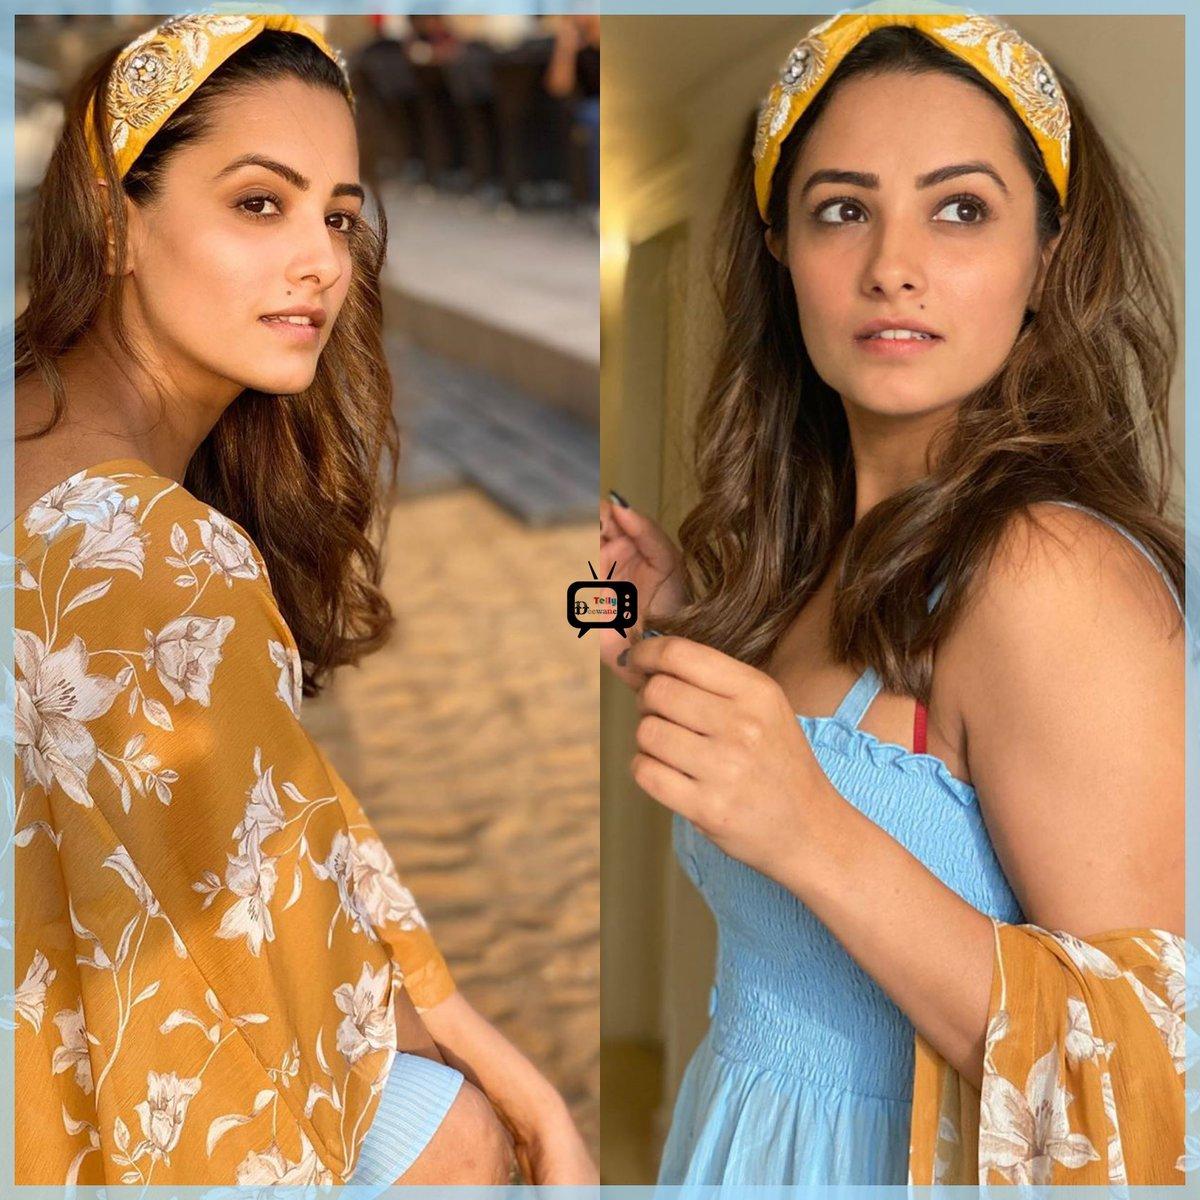 Gorgeous Anita Hassanandani #AnitaHassanandani #Naagin4  #AnitaHassanandaniReddy #Vishaka #Vish  #Naagin3 #Shagun #YHM  @TellyDeewanepic.twitter.com/E1lEQjEI4J